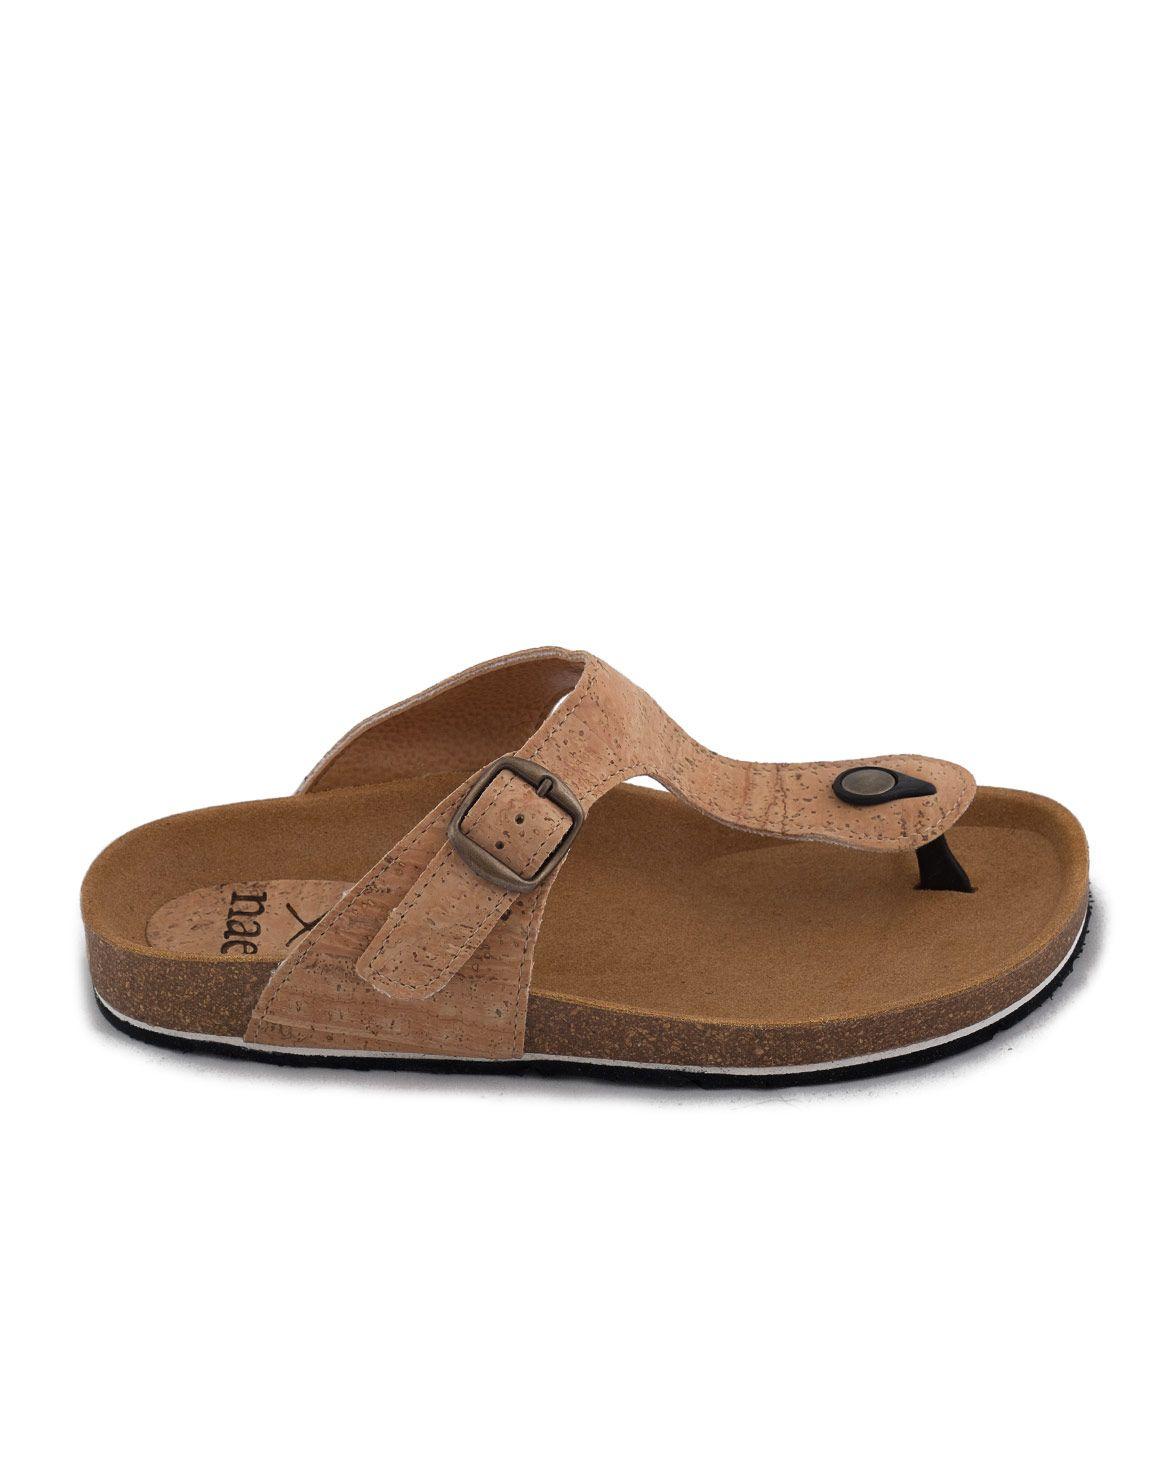 kos sandale kork vegan fair vegane schuhe pinterest vegan shoes sandals and fashion. Black Bedroom Furniture Sets. Home Design Ideas